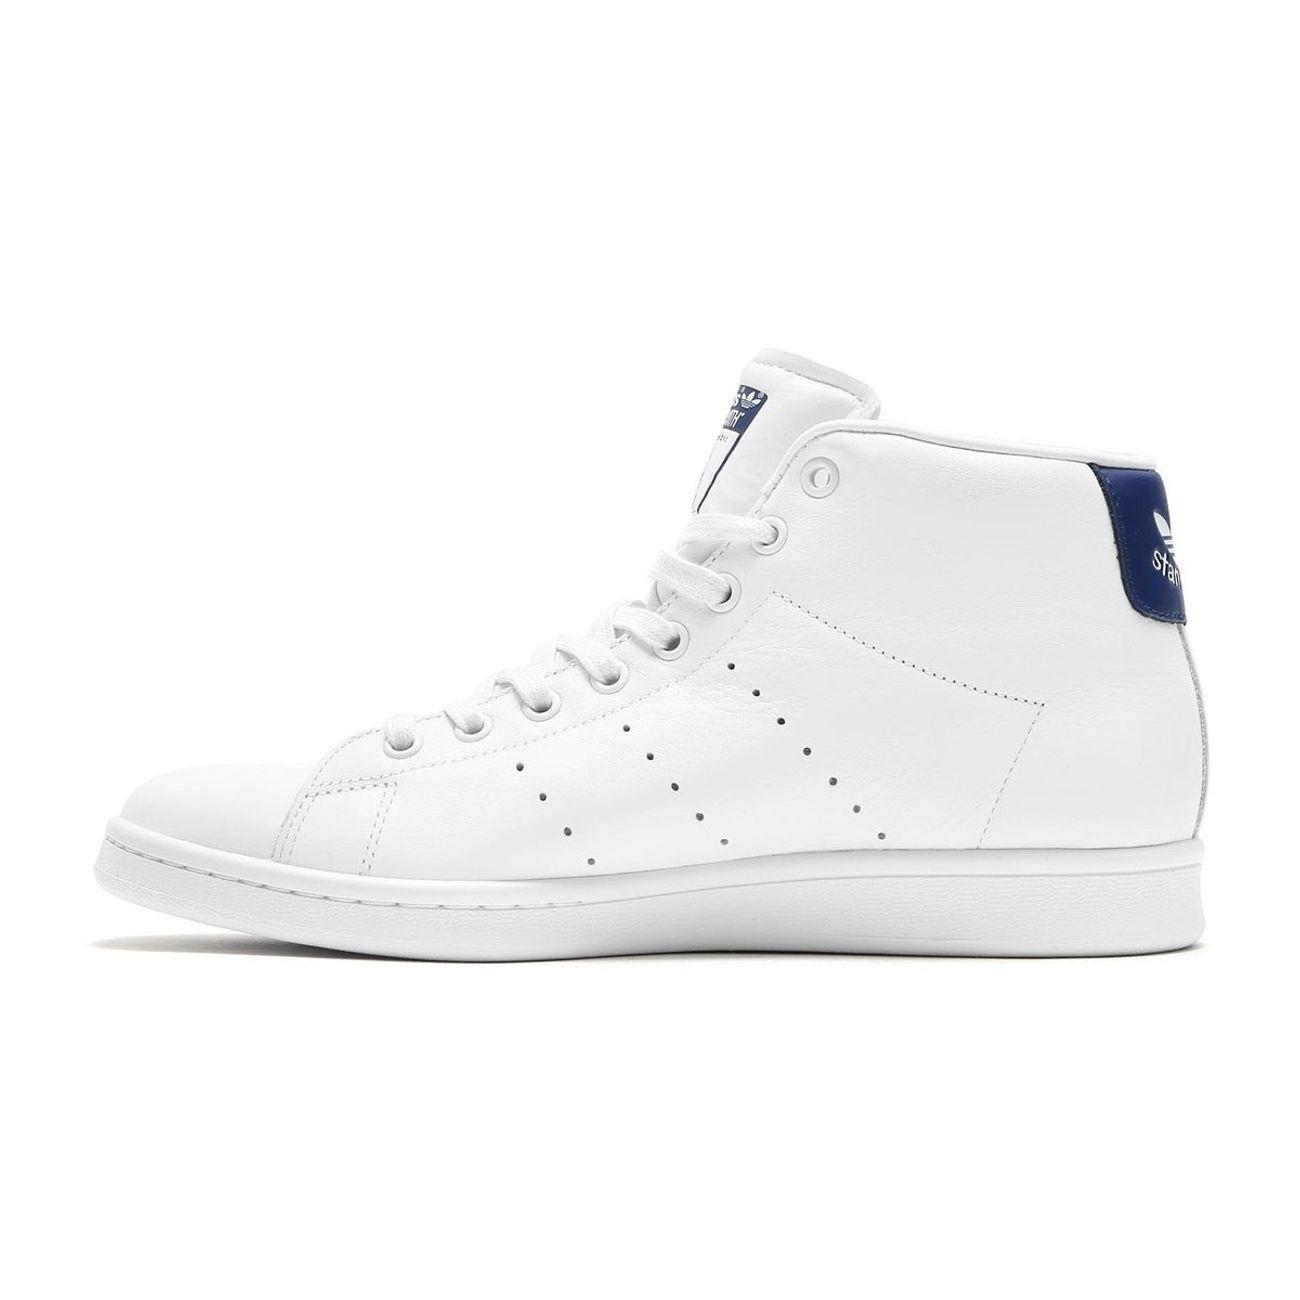 Mode- Lifestyle homme ADIDAS ORIGINALS Basket adidas Originals Stan Smith Mid - BB0070